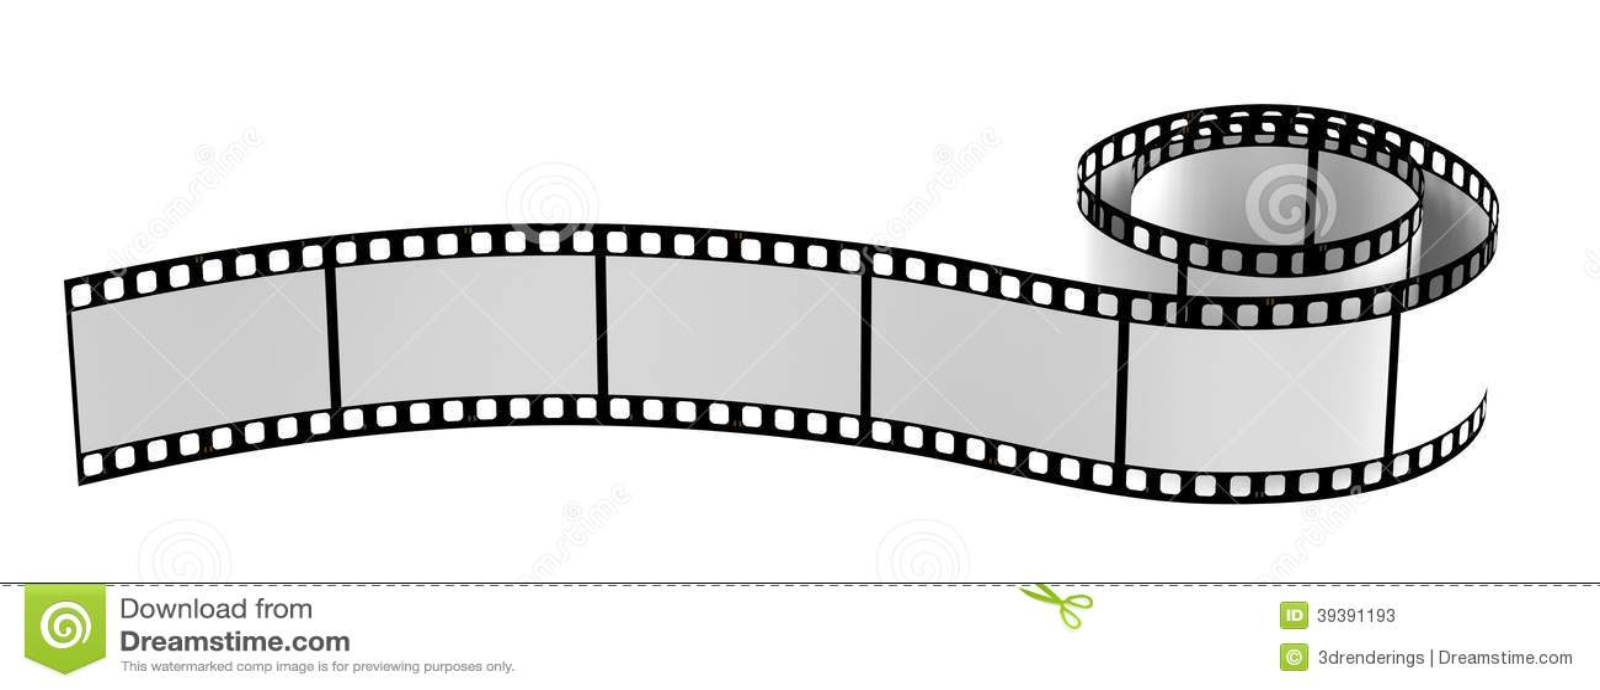 3d render of film reel stock illustration Illustration of frame